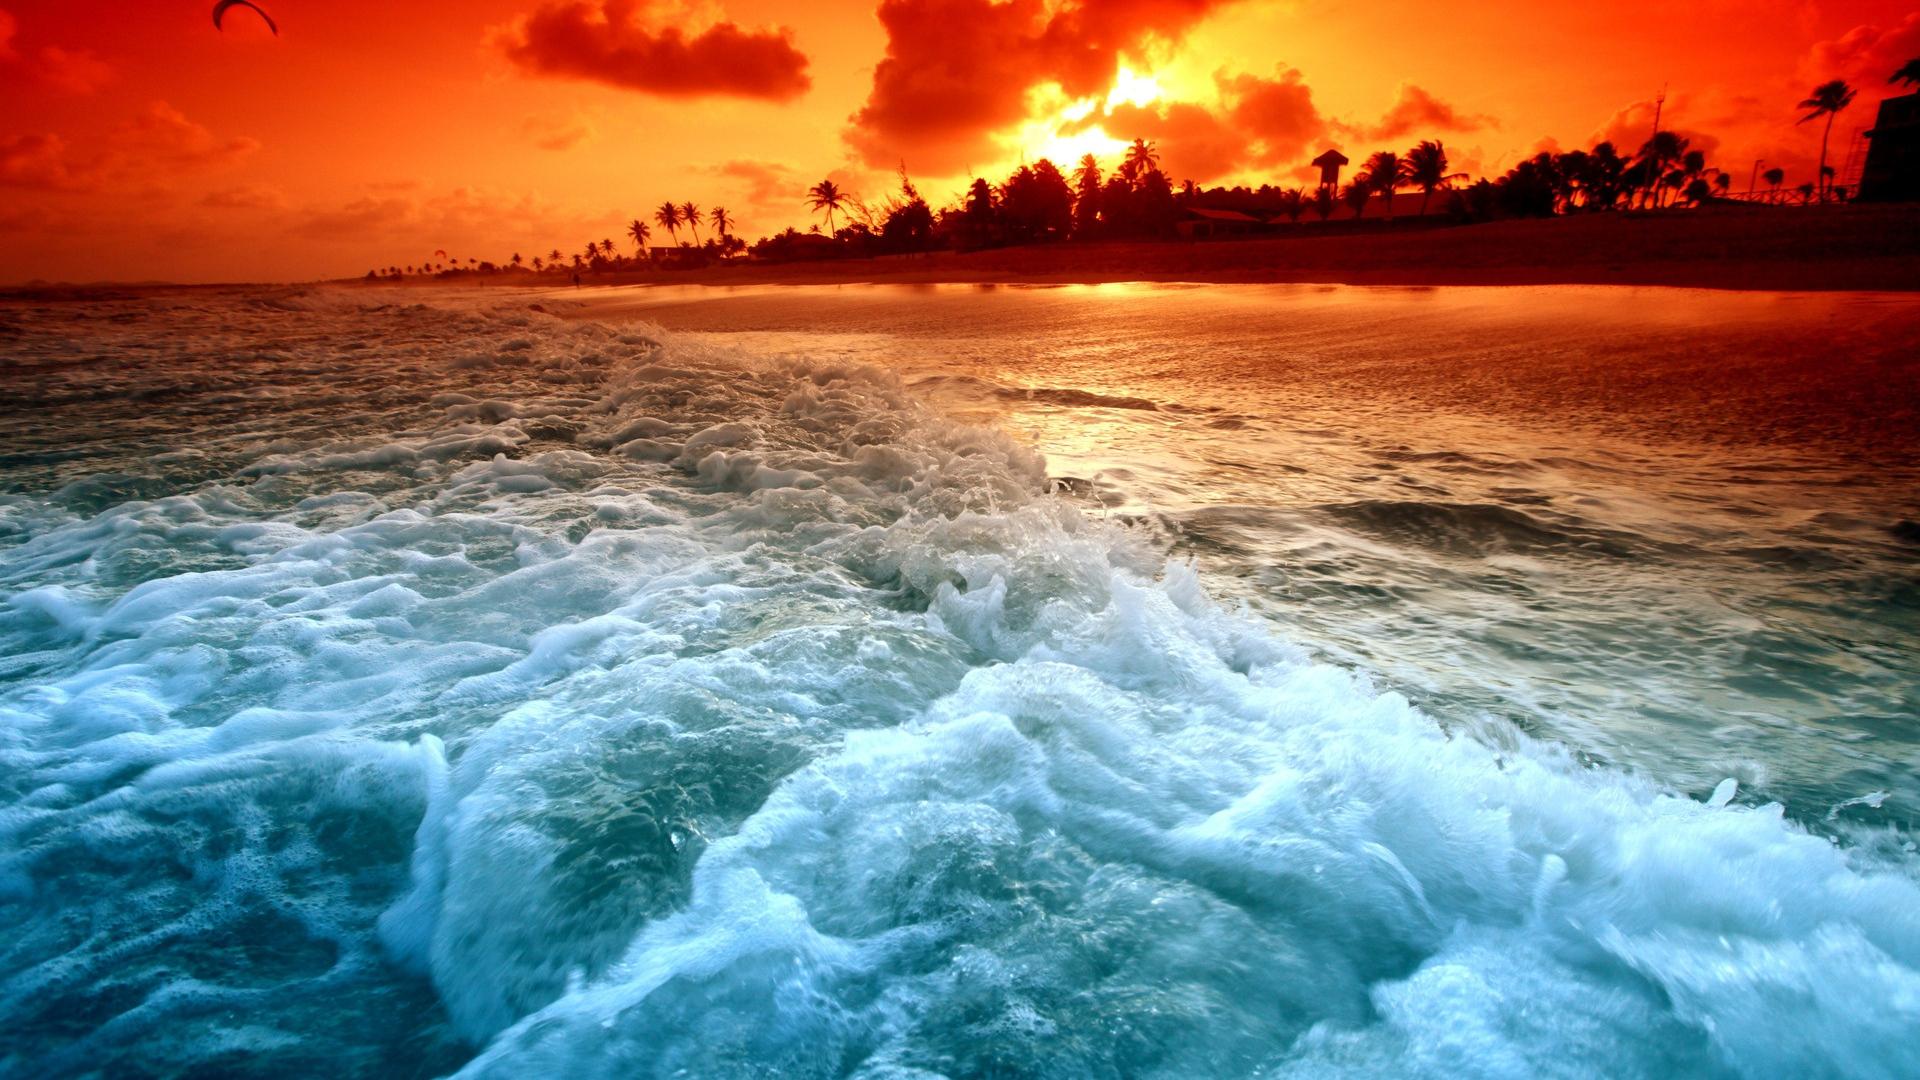 Download Wallpaper 3840x2400 Clouds, Decline, Evening, Sky, Orange ...